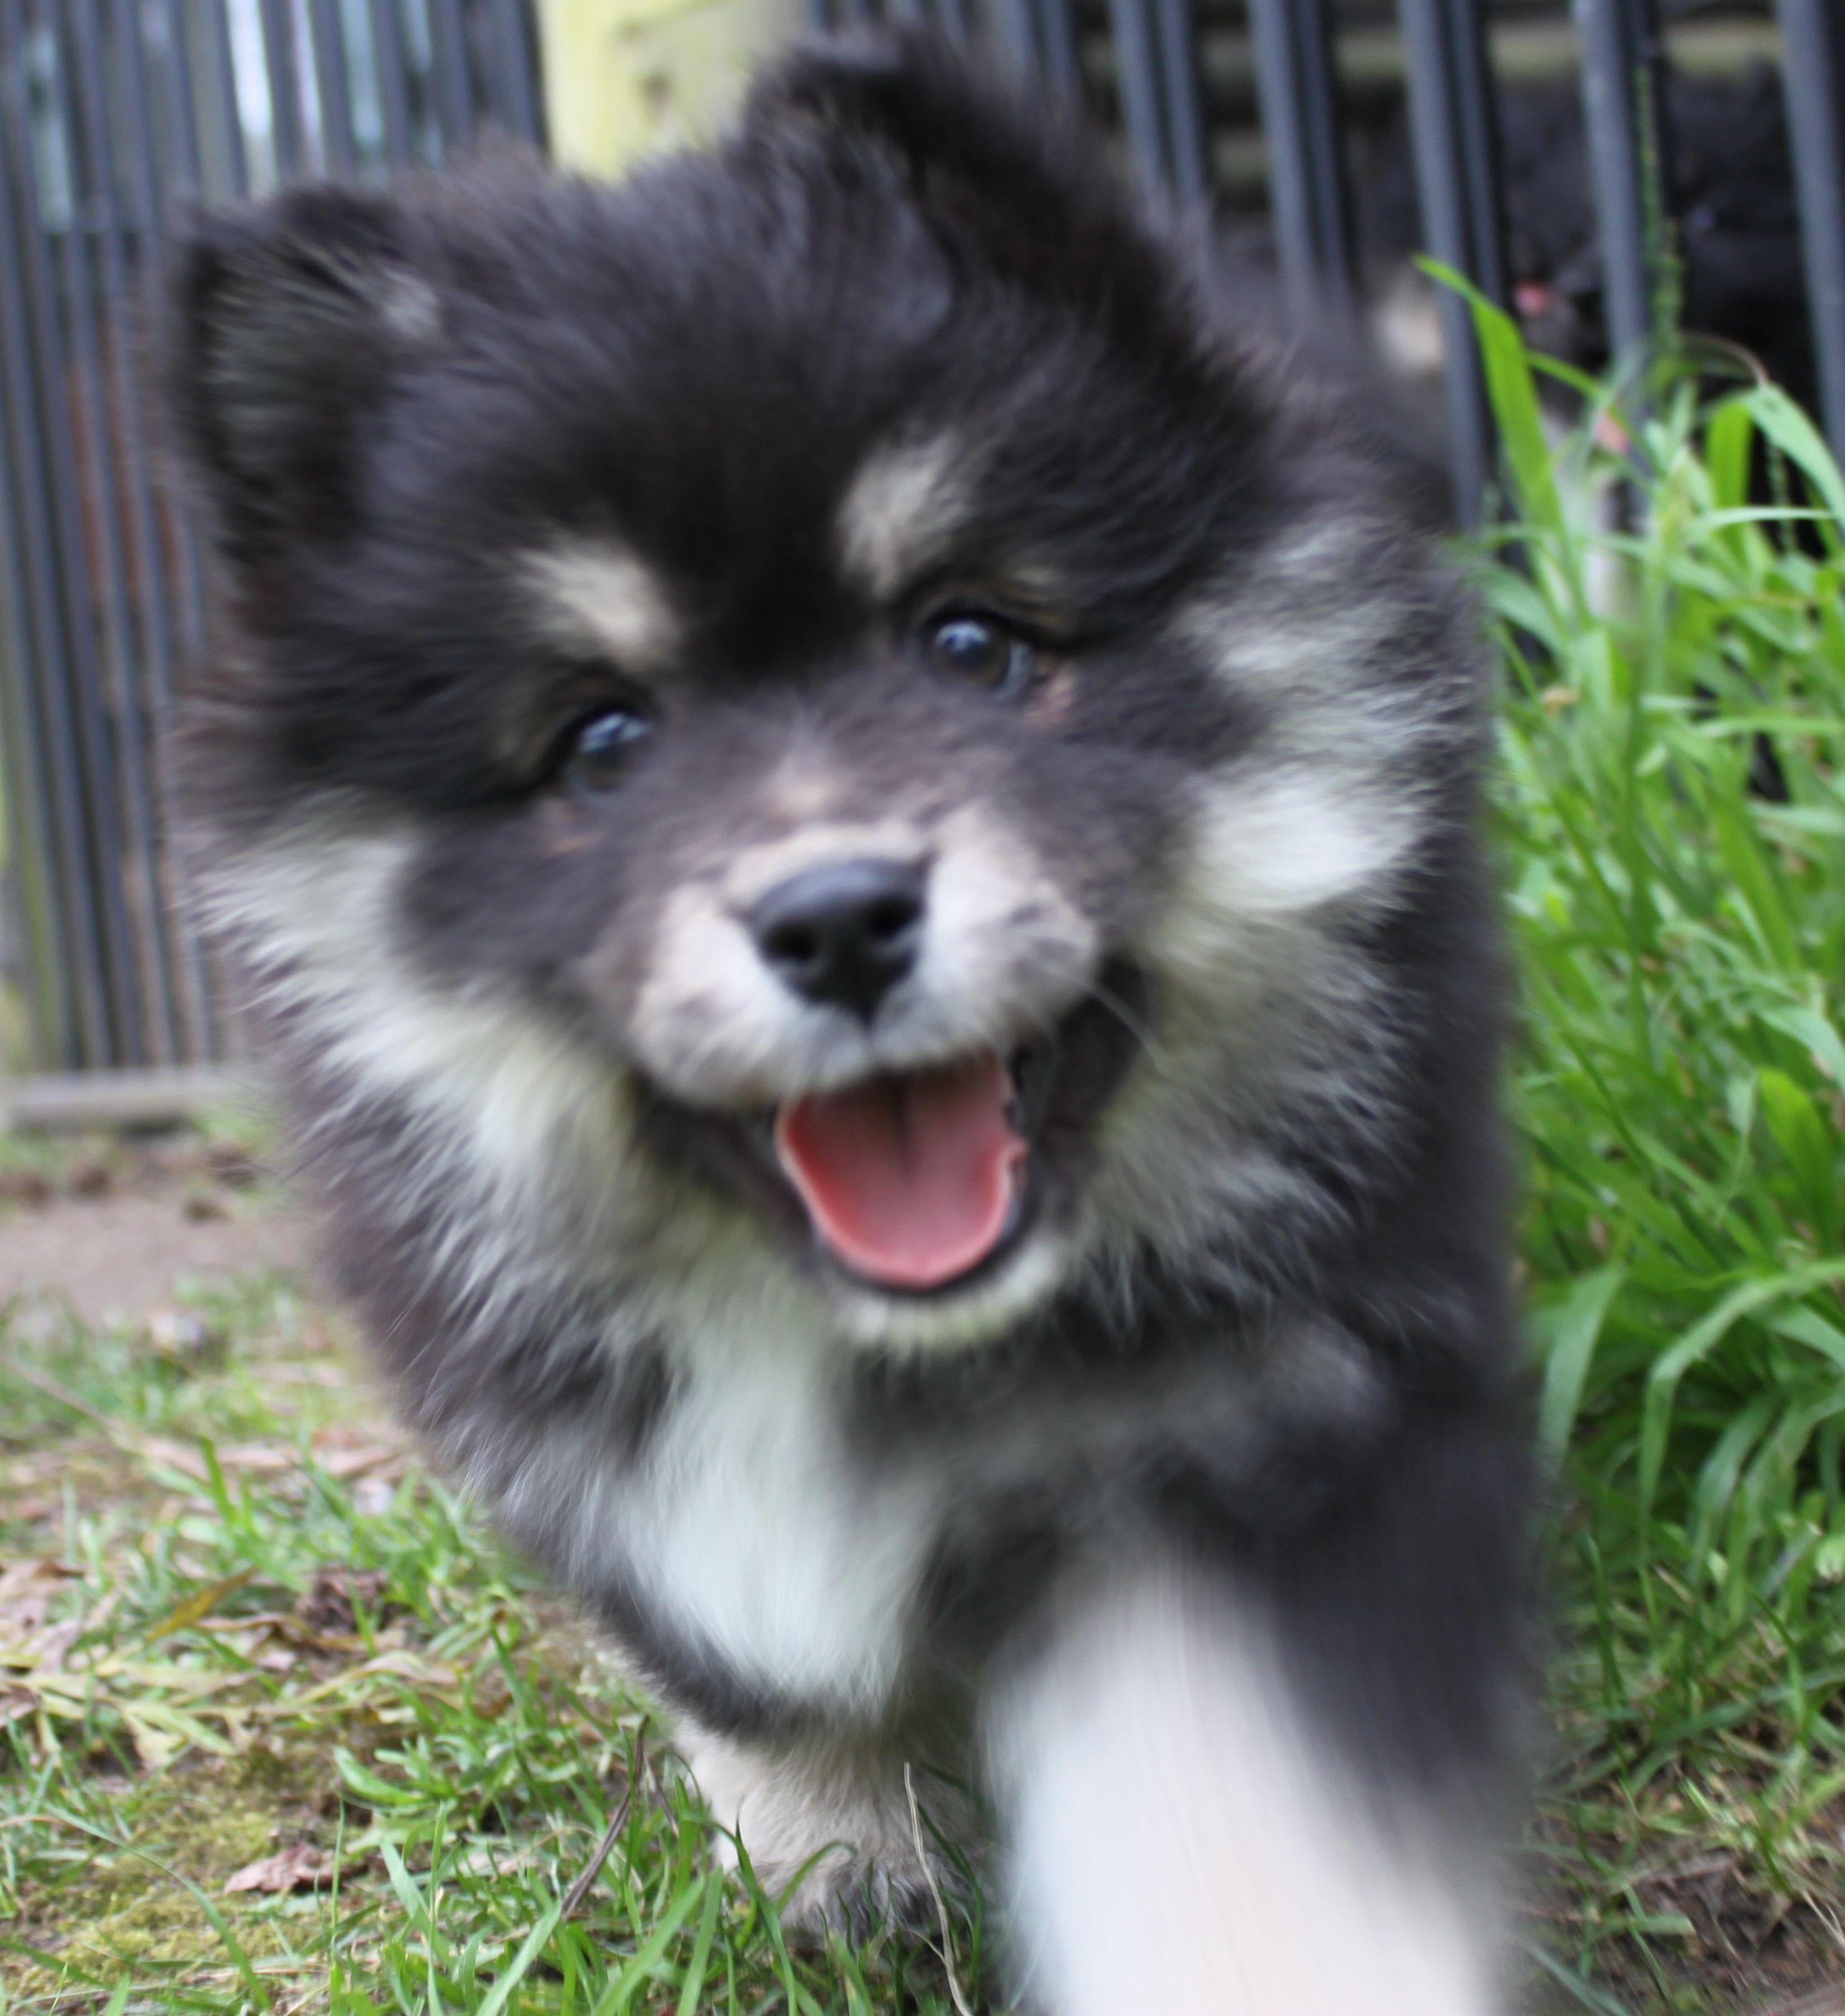 finnish Lapphund photo | Finnish Lapphund puppy photo and ... | 2570 x 2808 jpeg 531kB